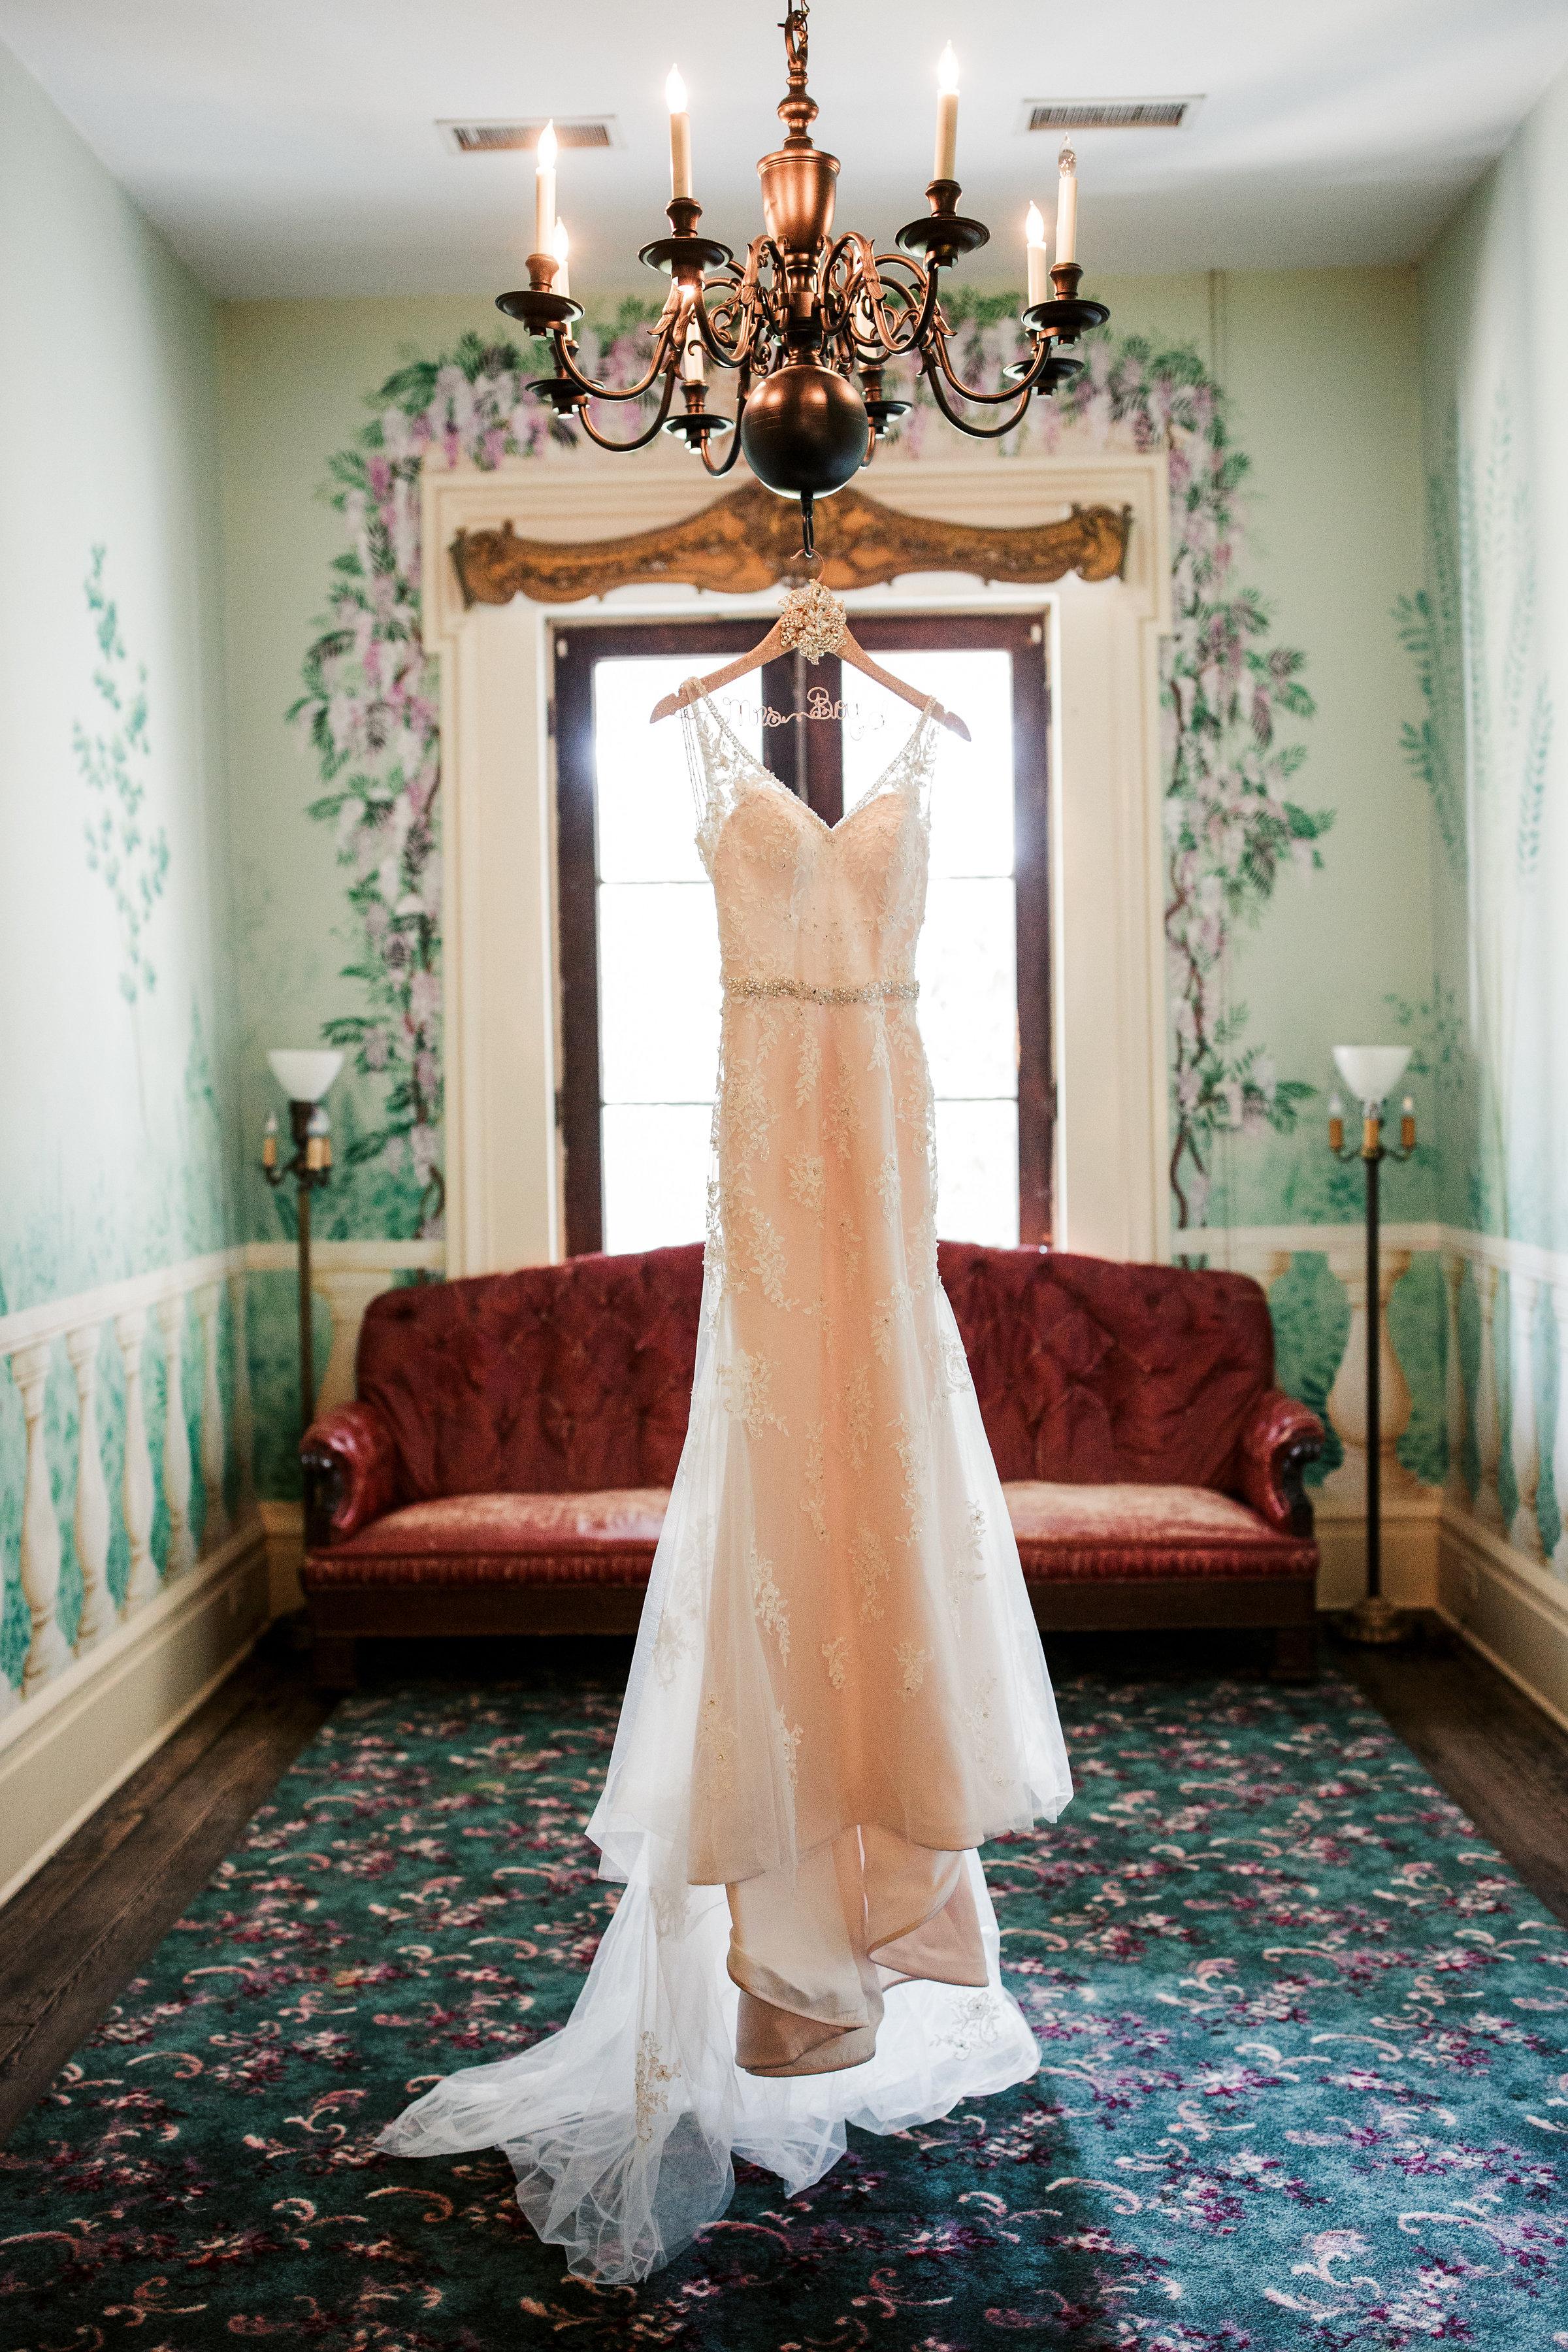 Riverwood-Mansion-Wedding1.jpg